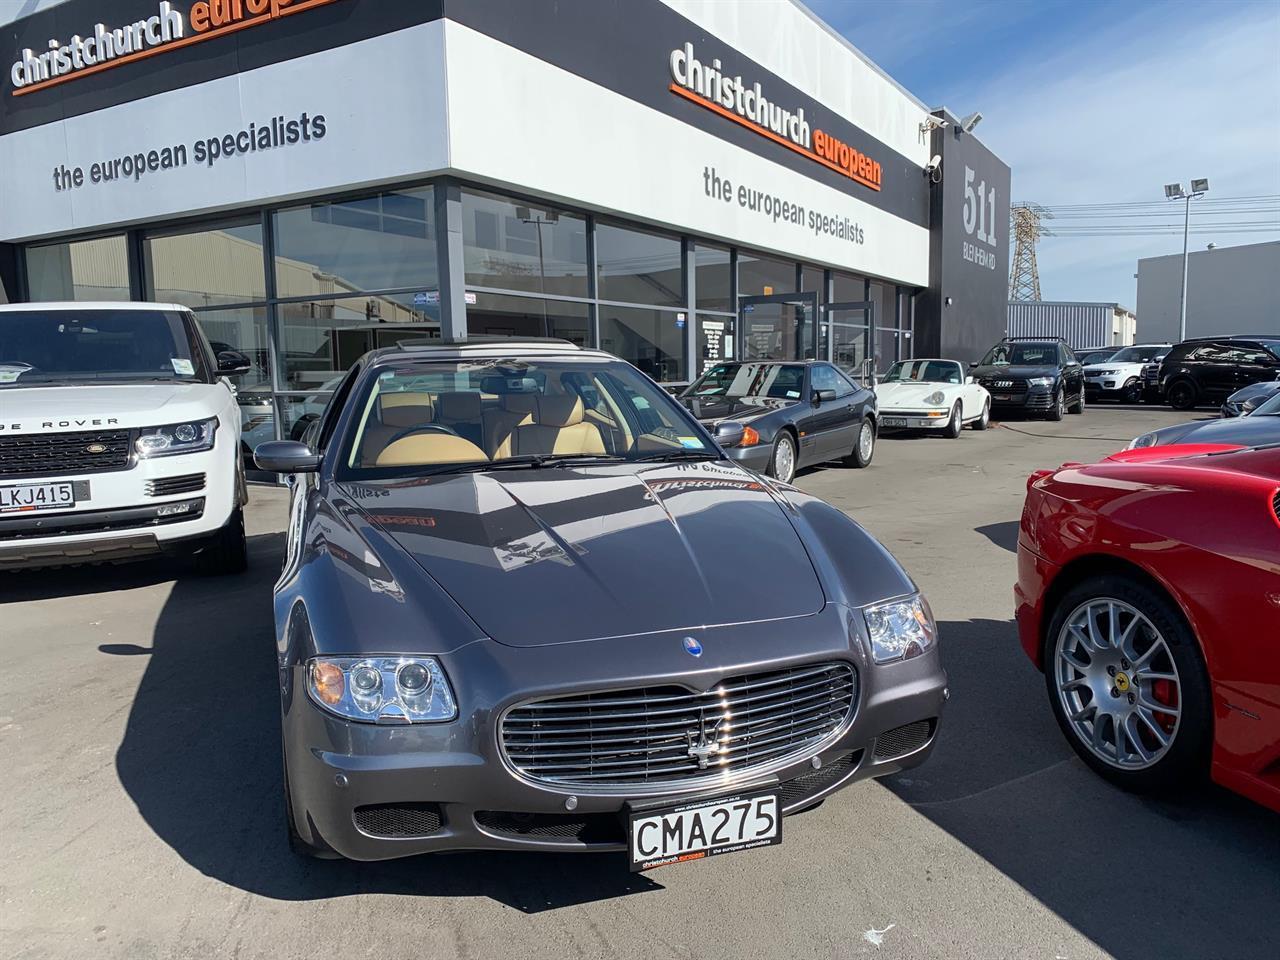 image-1, 2005 Maserati Quattroporte 4.2 V8 NZ New Sedan at Christchurch